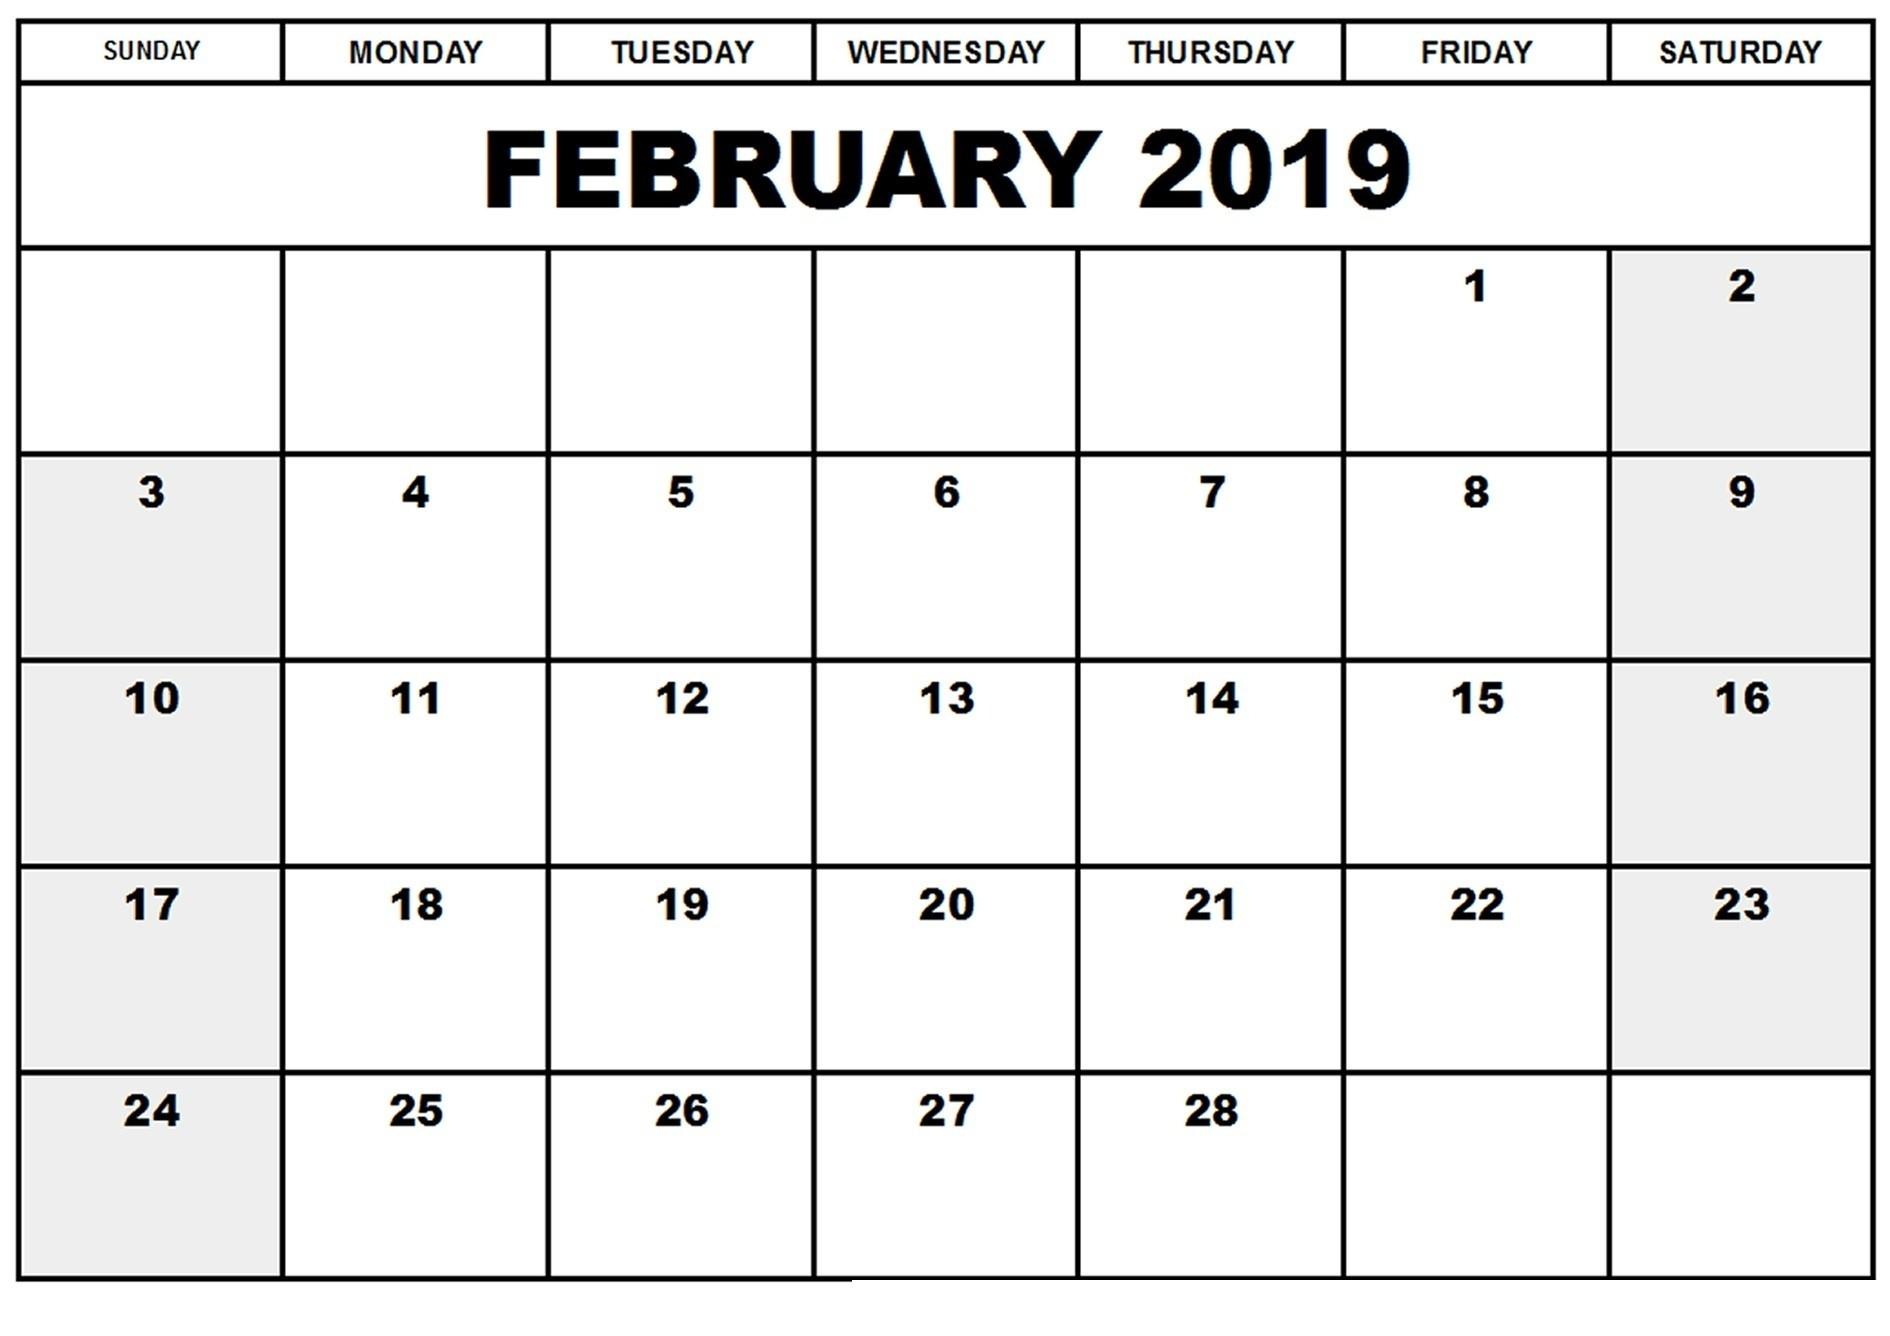 Calendar Blank Printable Monday Start A4 | Holidays Calendar Template  Calendar Blank Printable Monday Start A4